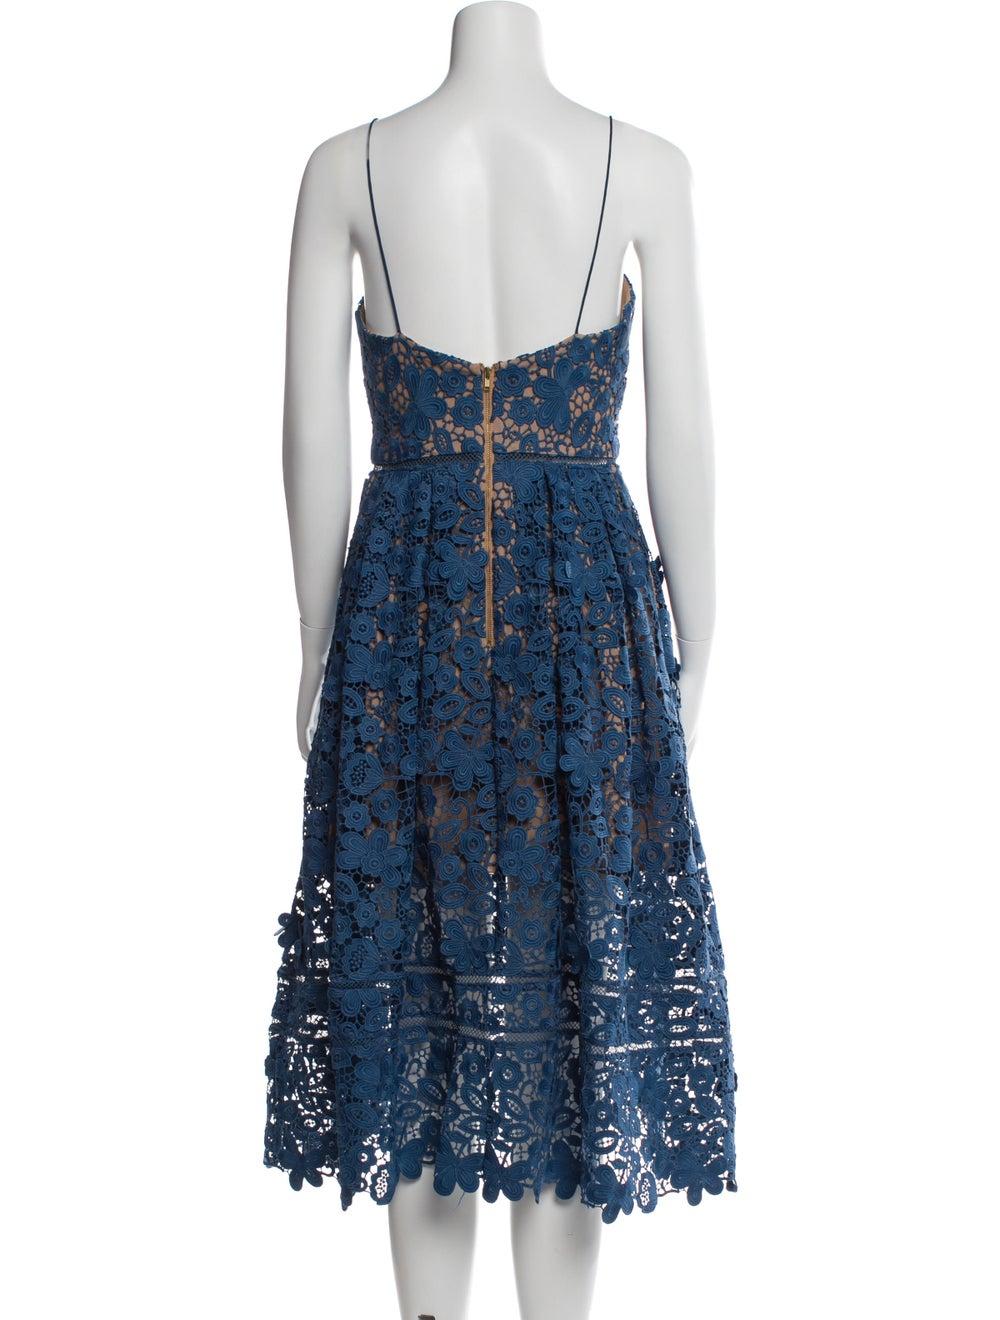 Self-Portrait Lace Pattern Midi Length Dress Blue - image 3